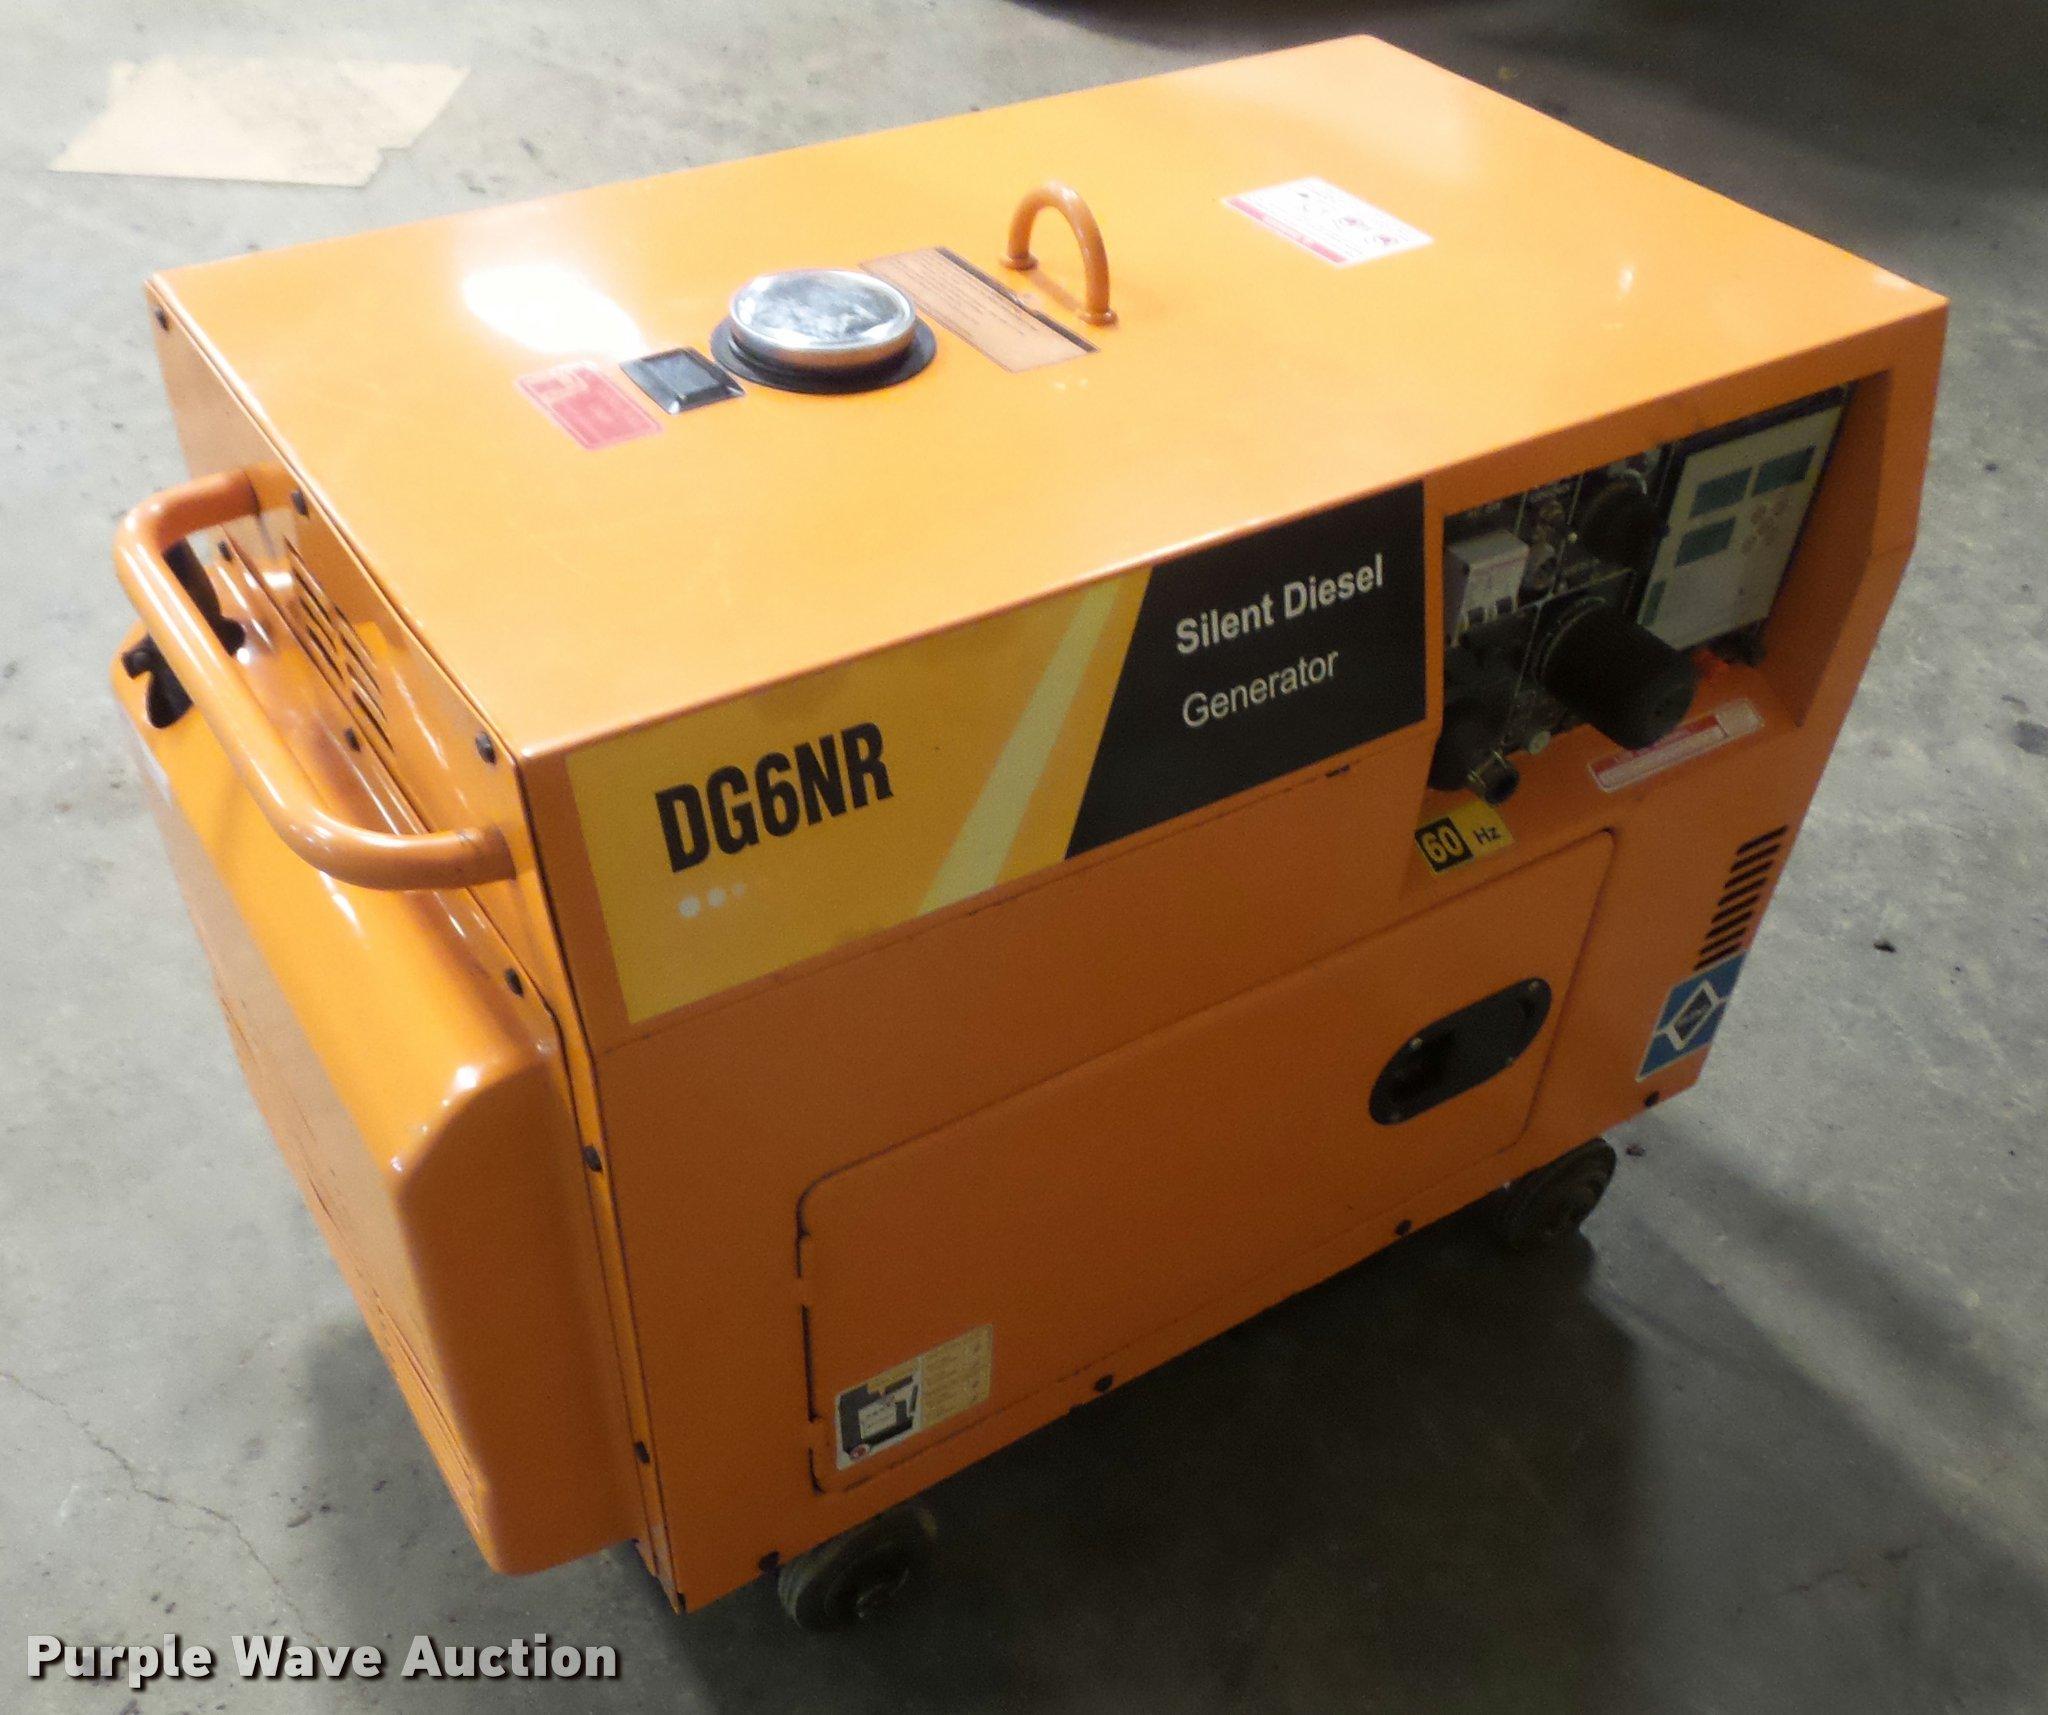 Deyong DG6NR generator Item DB2905